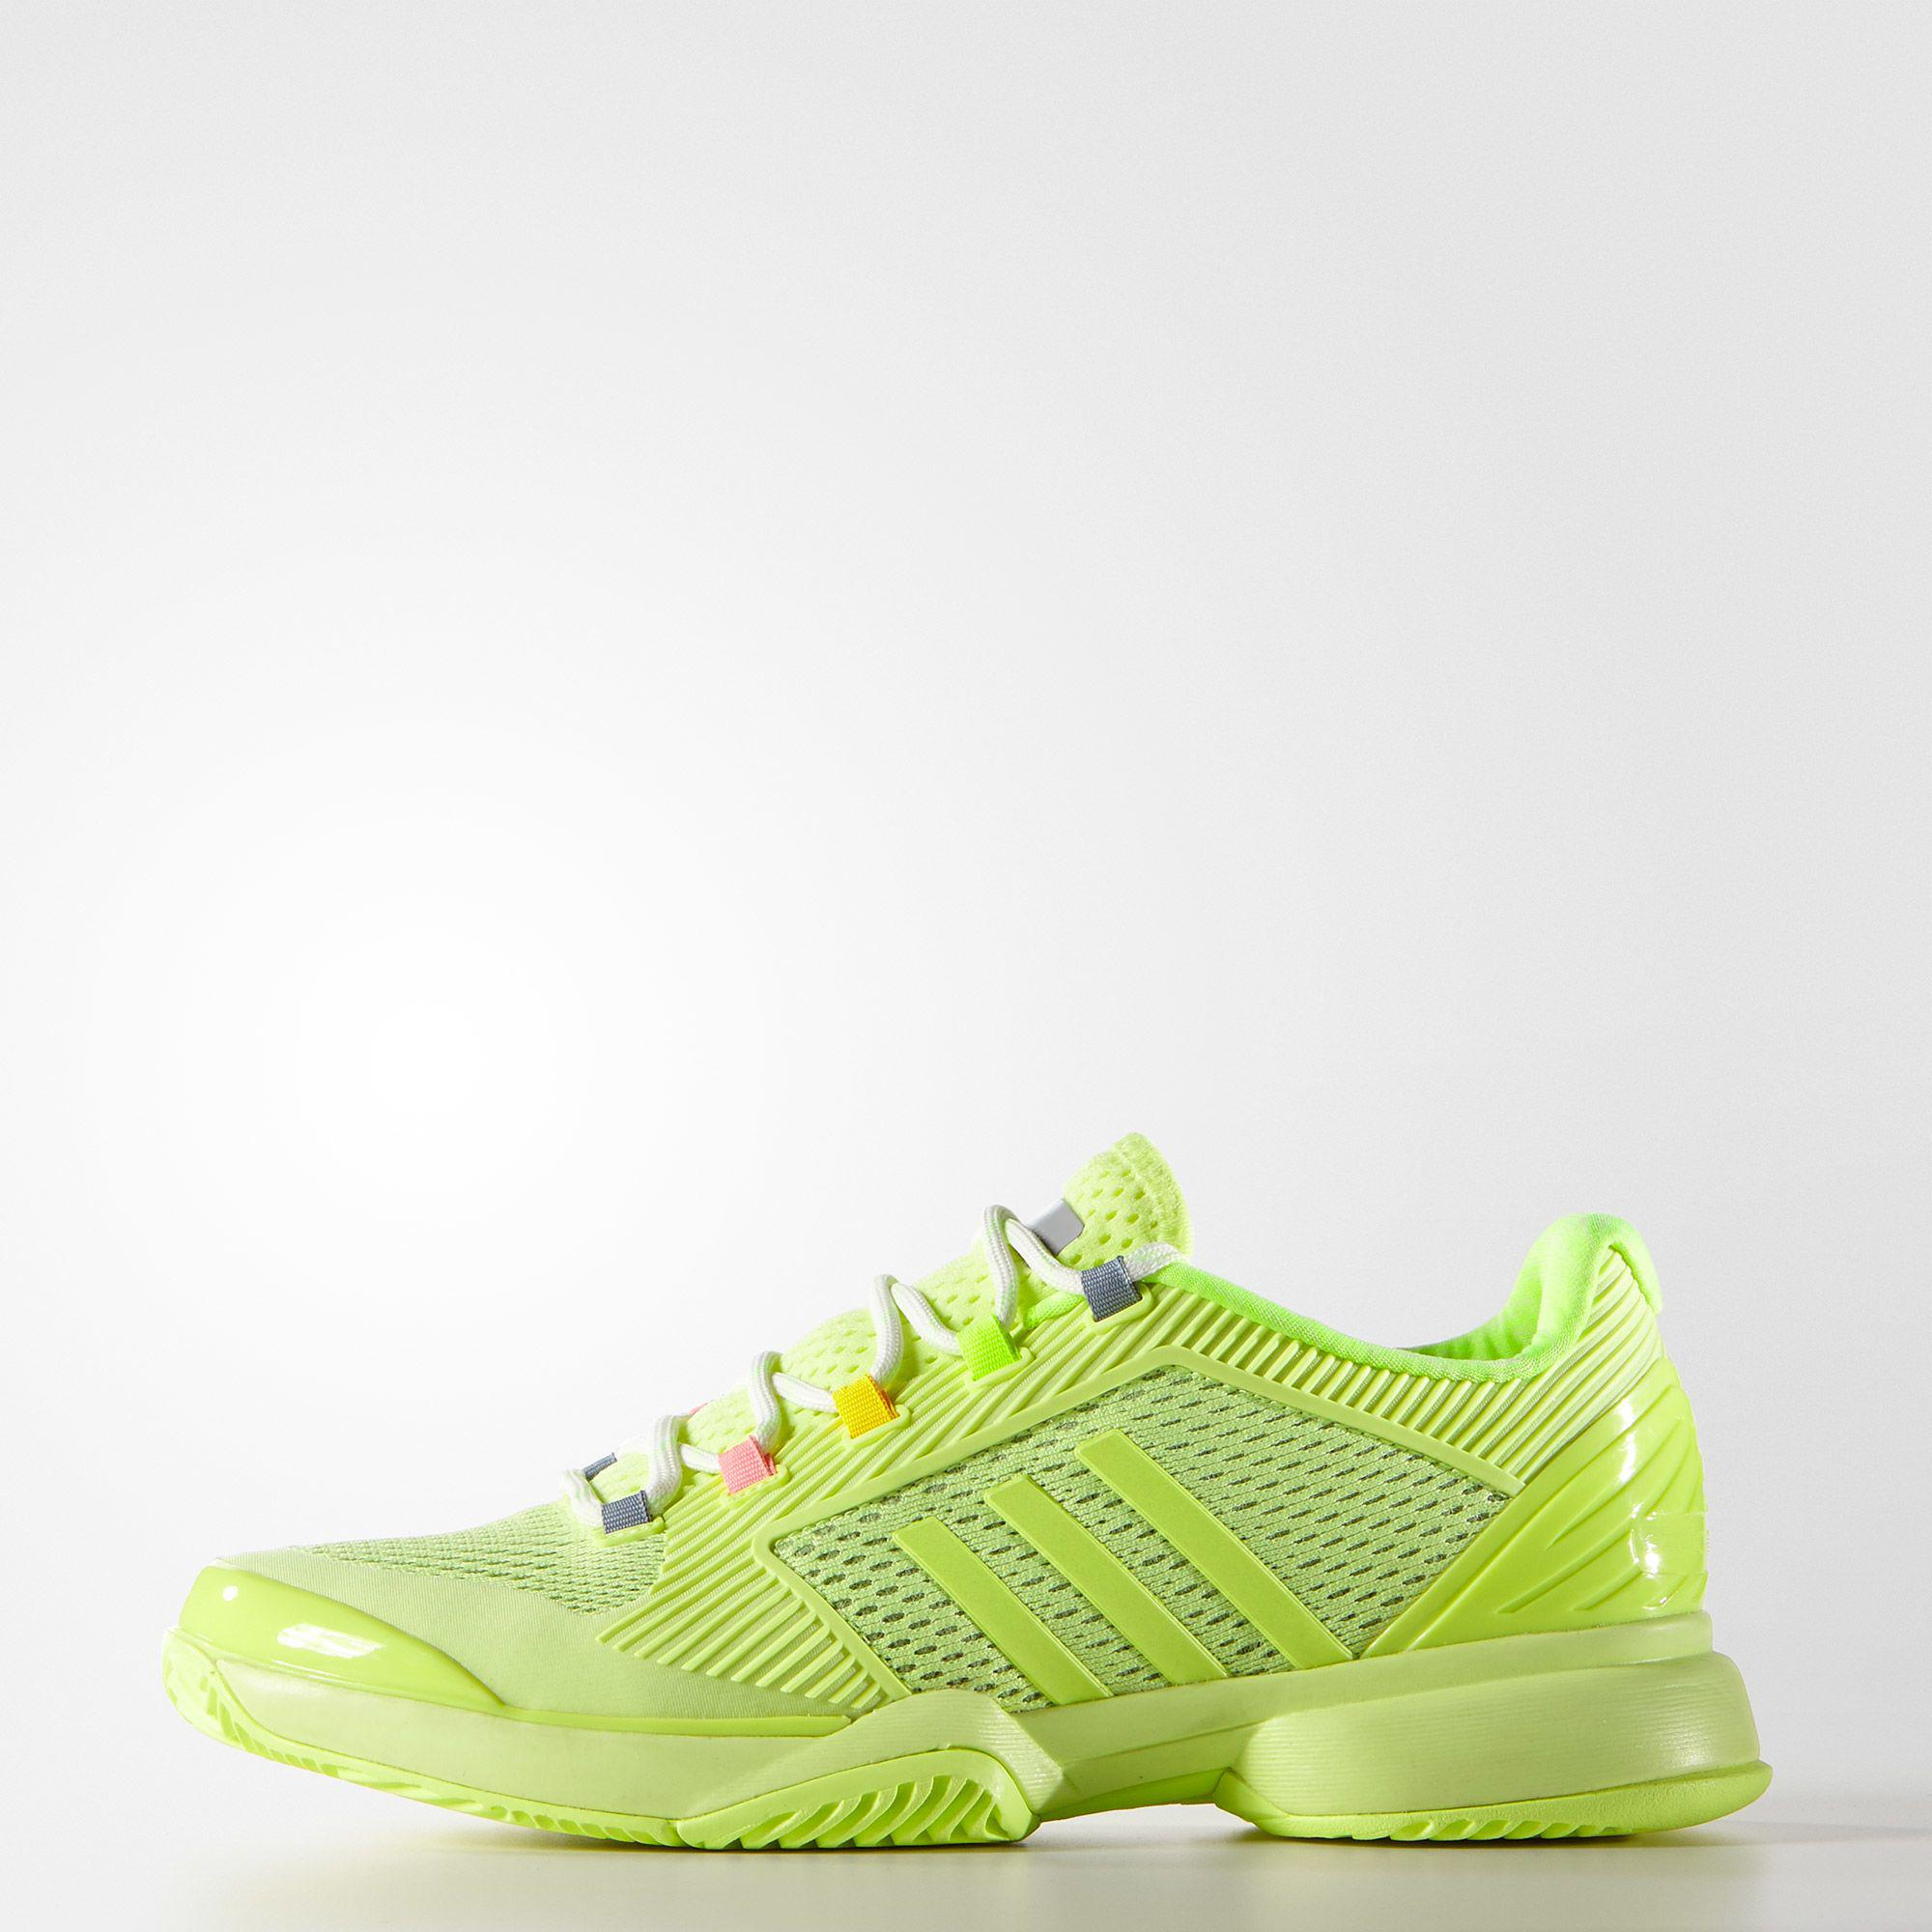 Adidas Stella Barricada 2015 Zapatos De Mujer Resplandor Amarillo bpiEFVRIQ